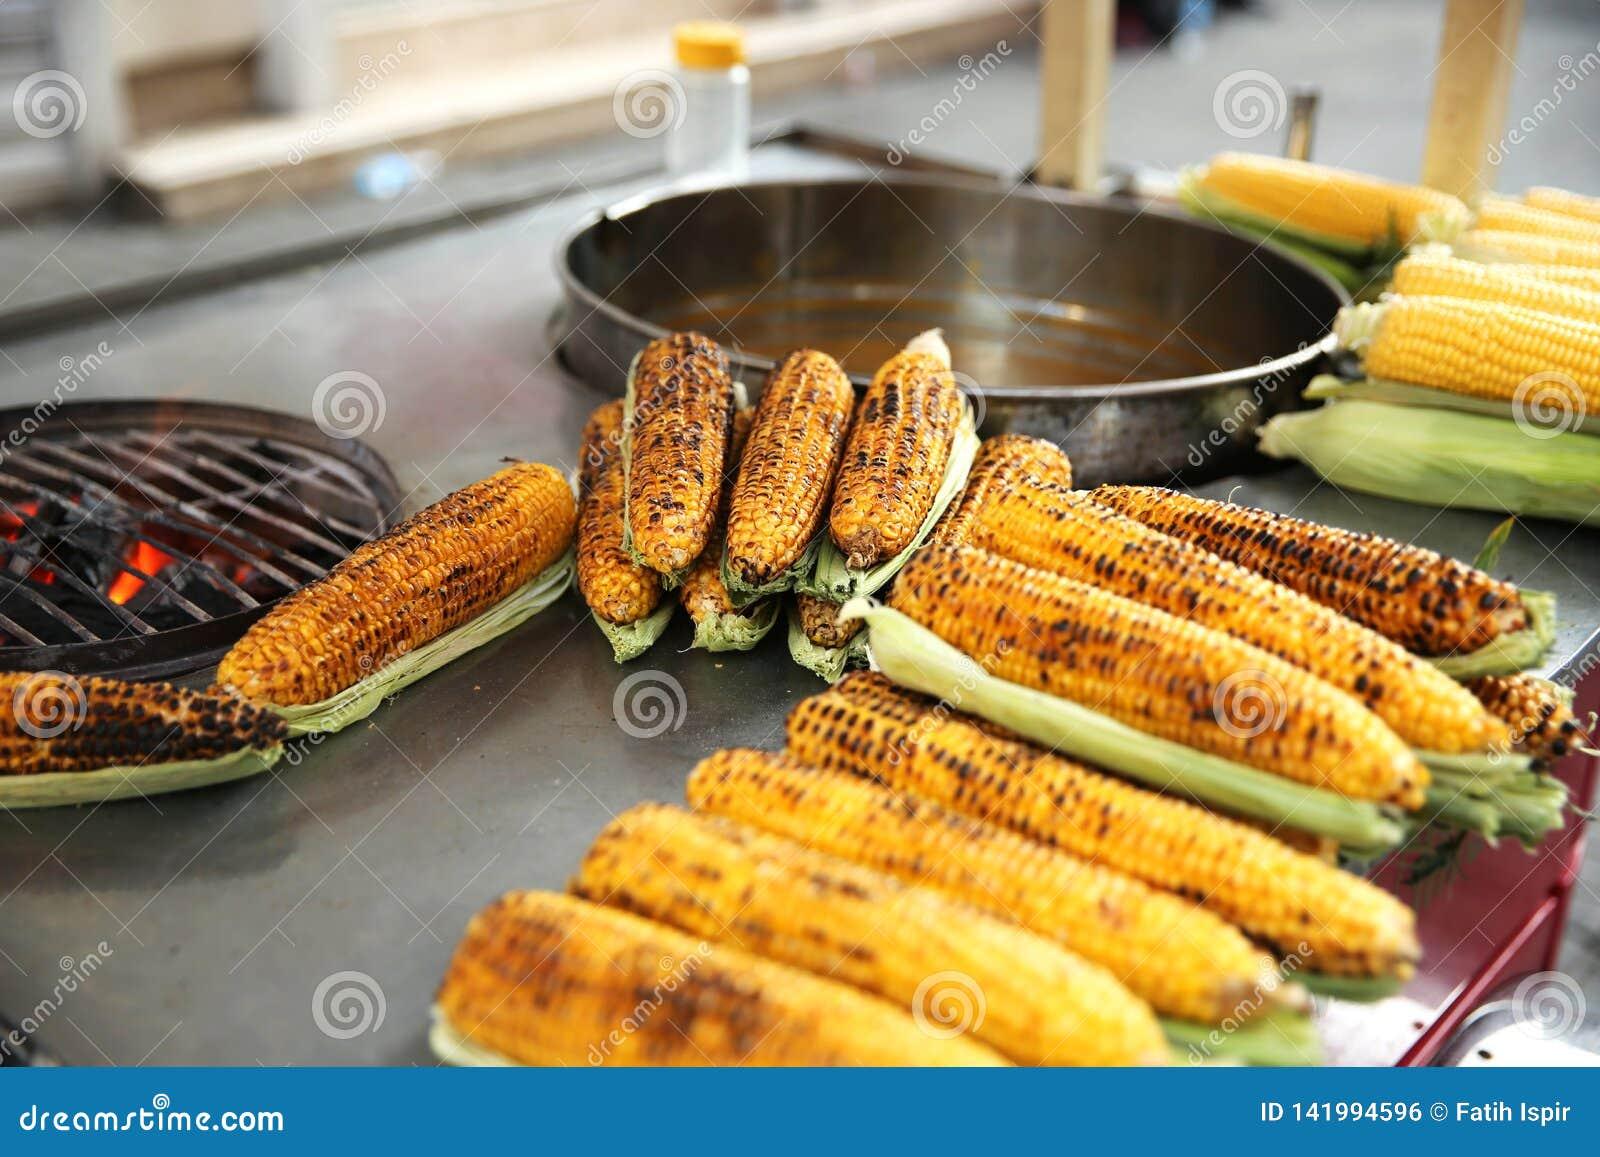 Delicious Corn in Istanbul